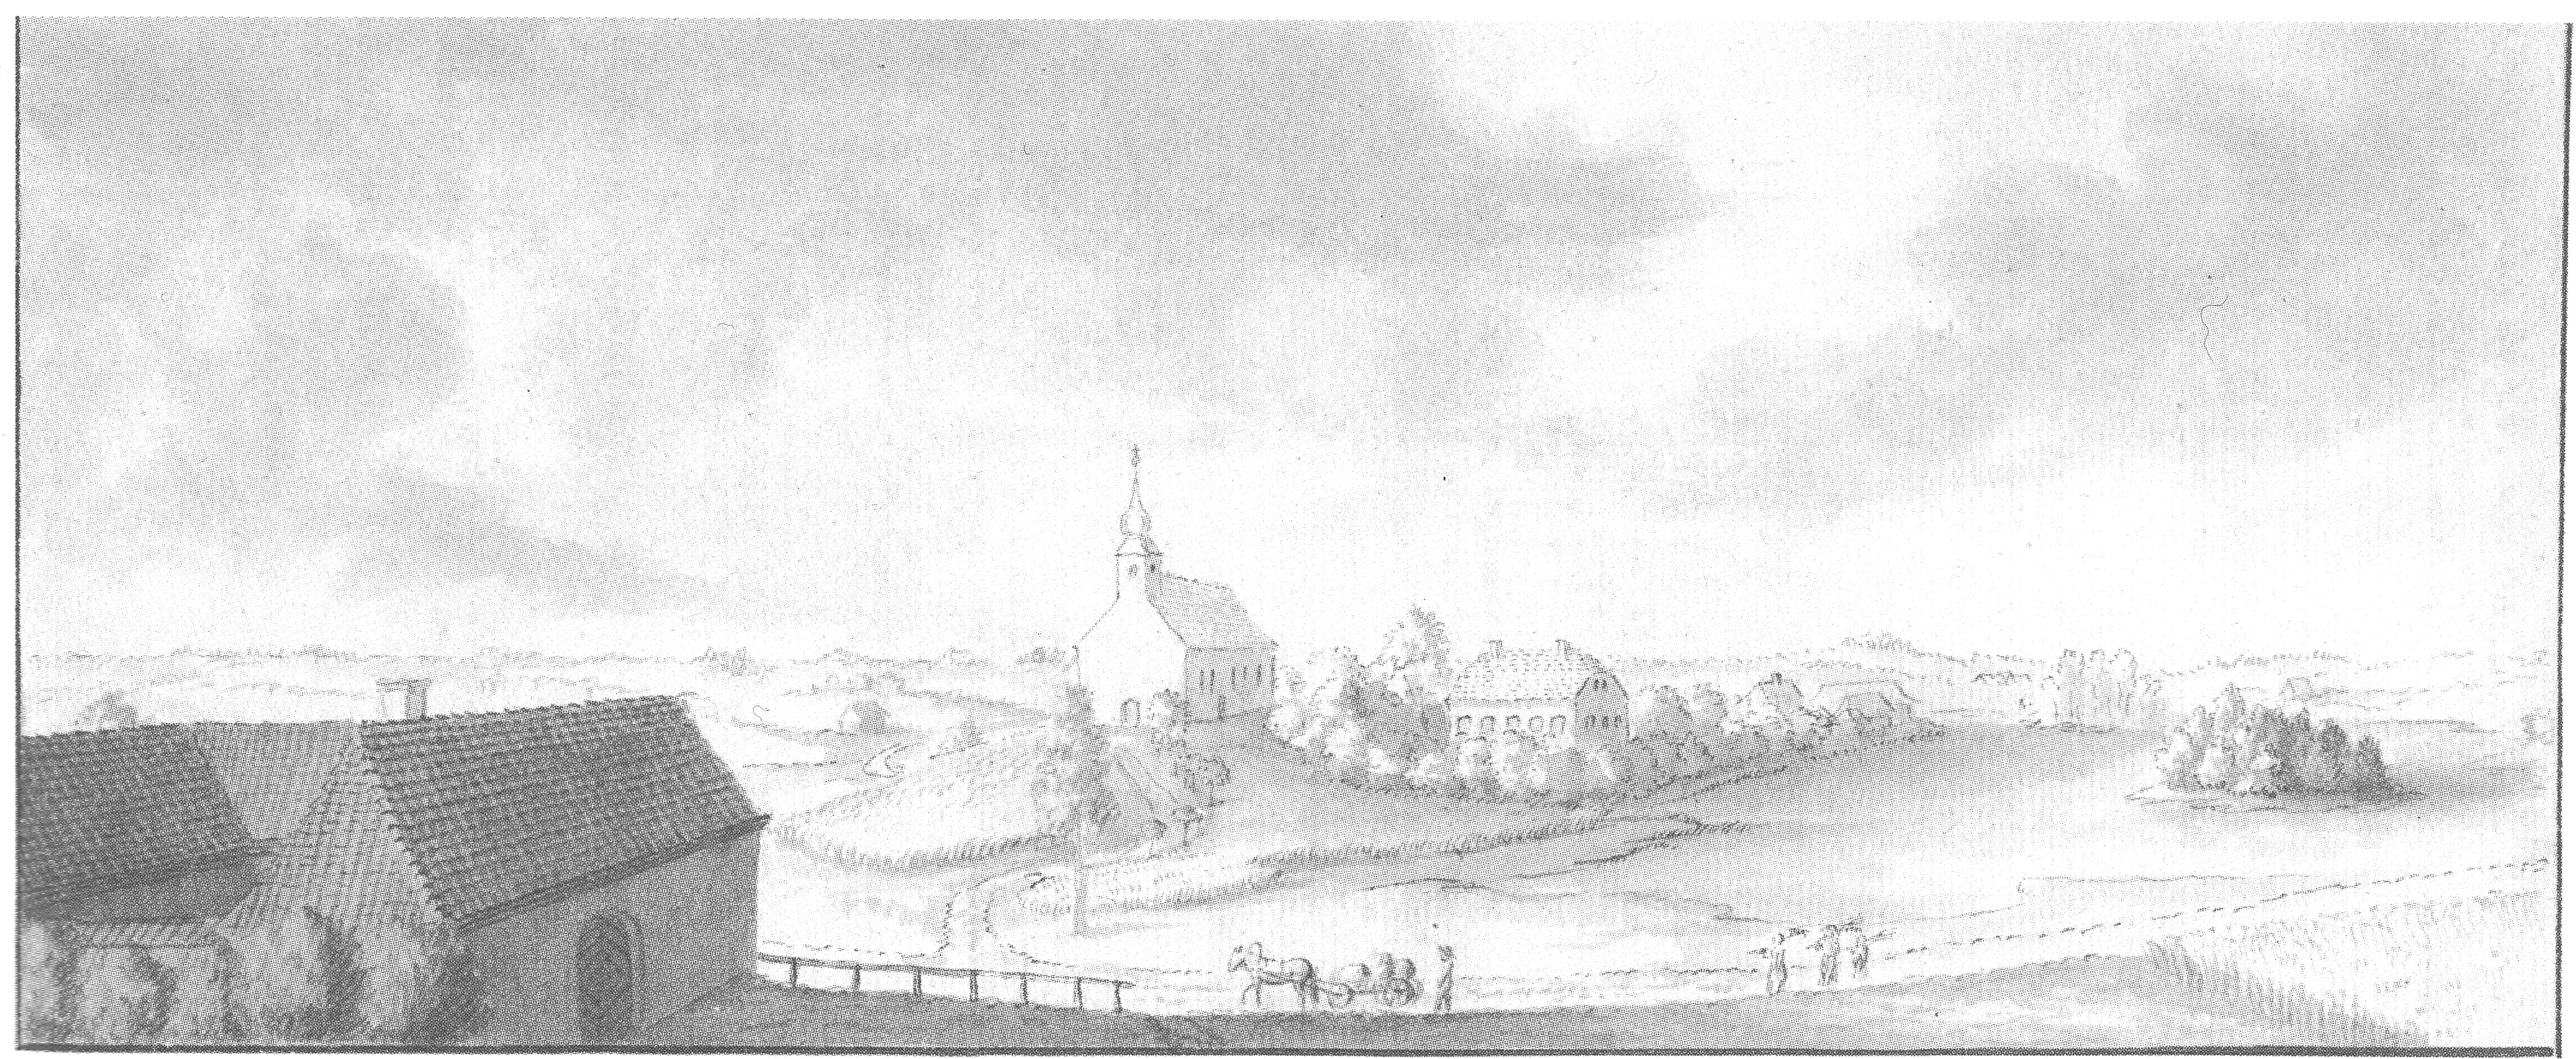 Панорама Арайшей. Рисунок И.К. Броце, 1800 год.